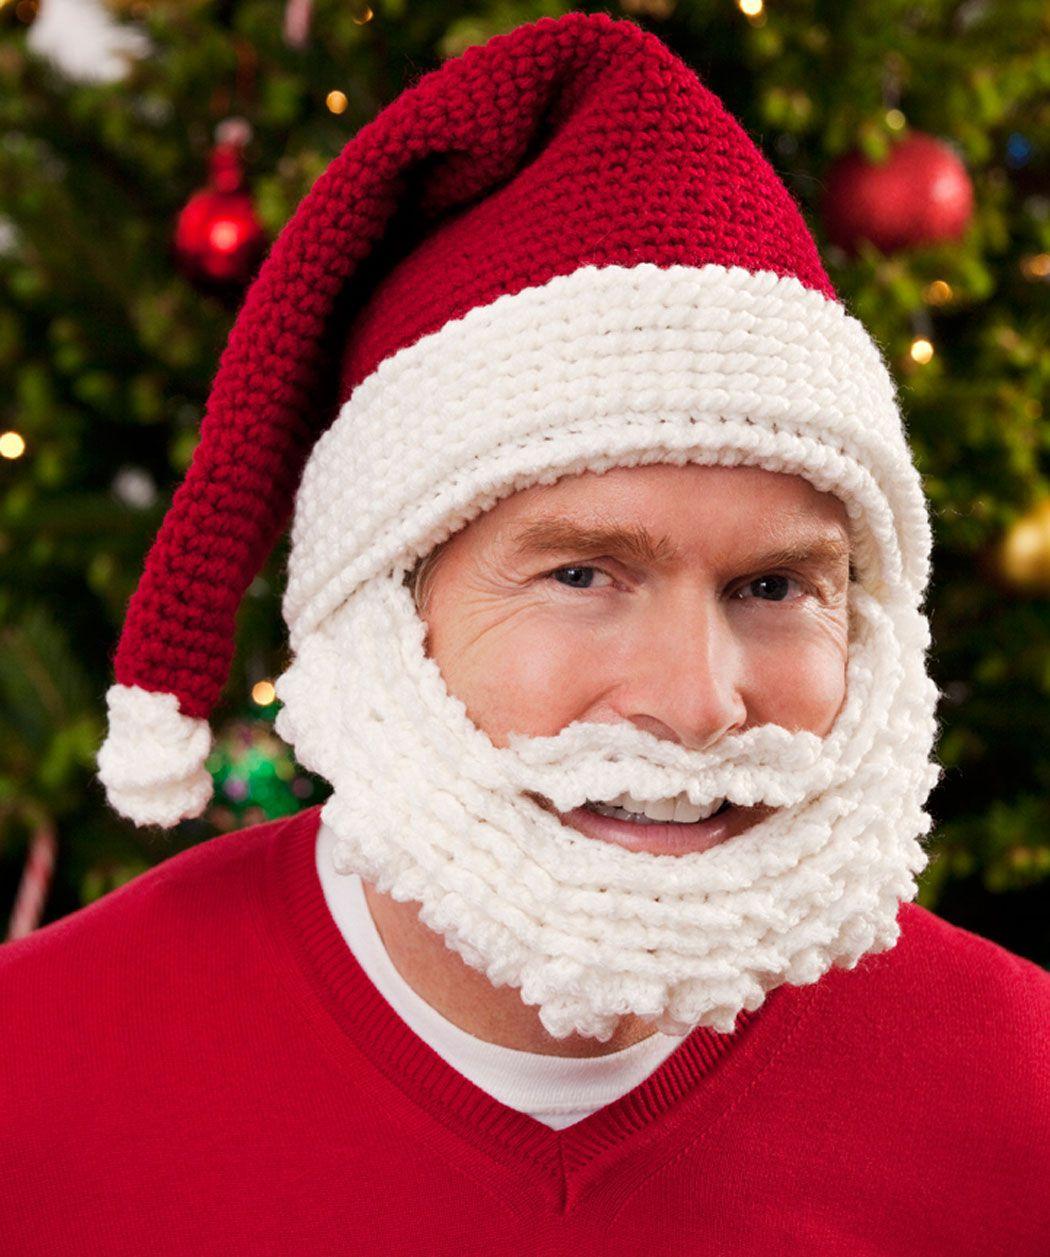 Santa Hat and Beard Crochet Pattern | Crochet Christmas | Pinterest ...